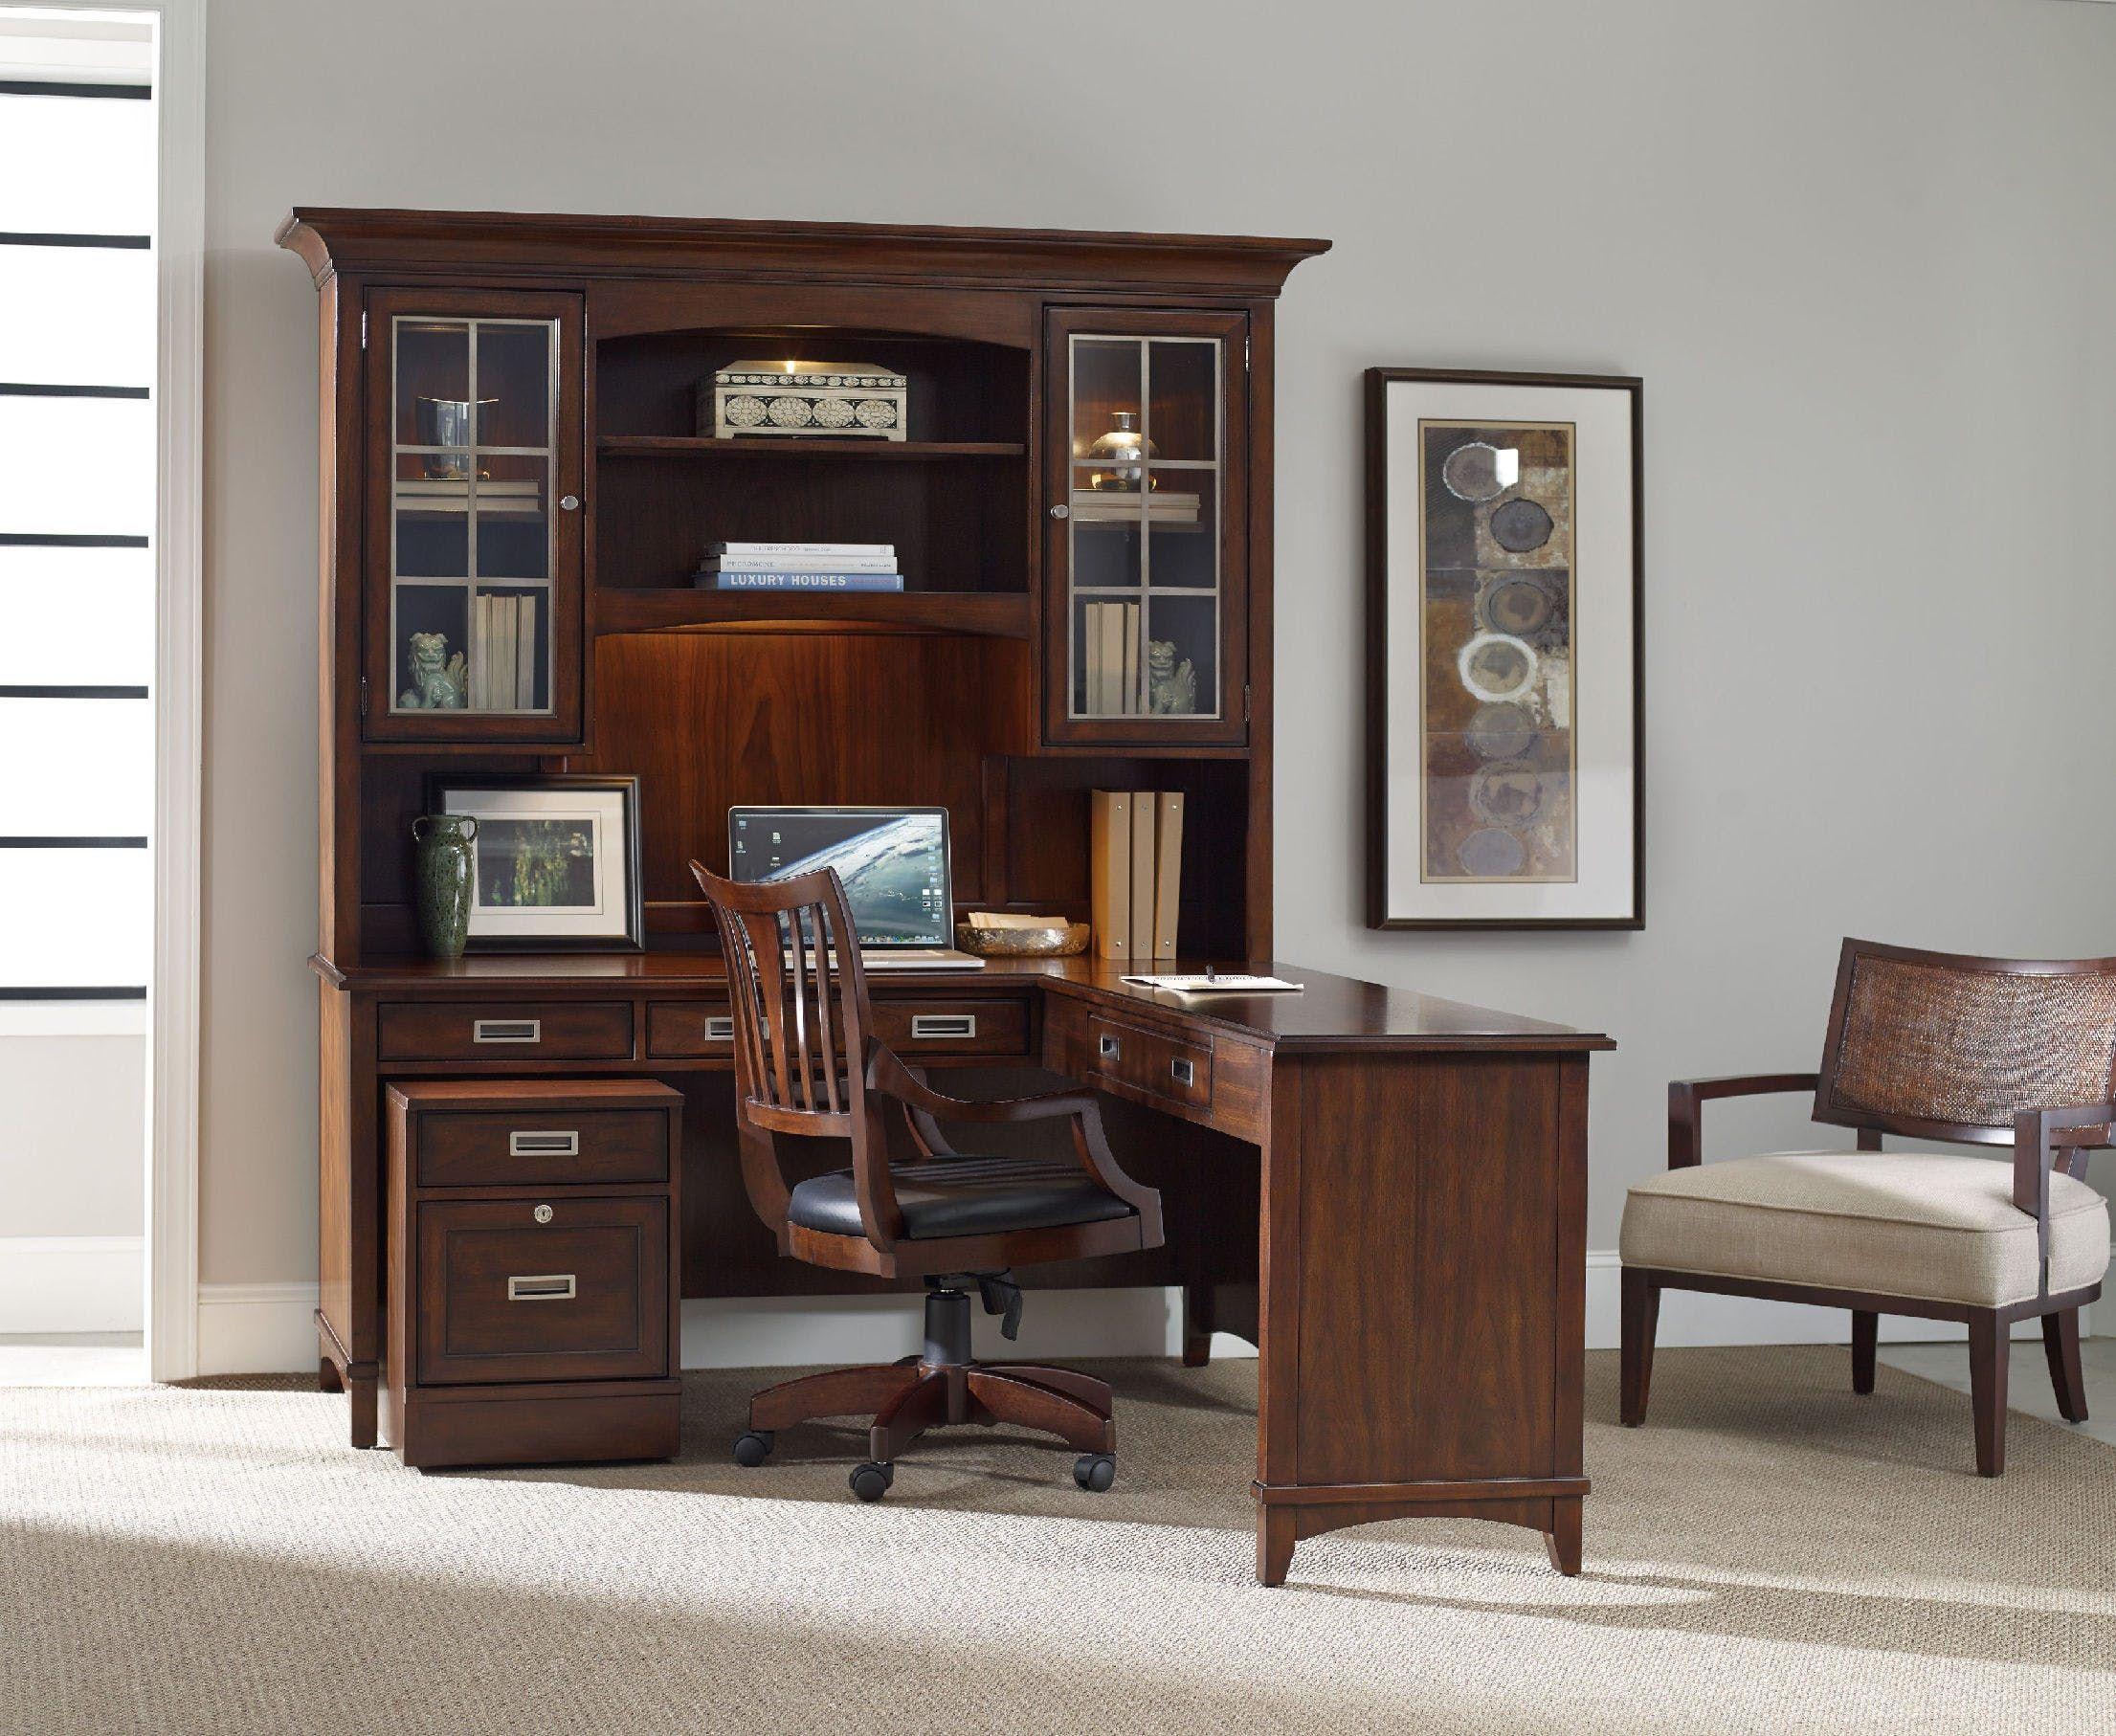 Hooker Furniture Latitude Modular Group. Writing Desk: 66x24.  Left/Right Return: 52x20.